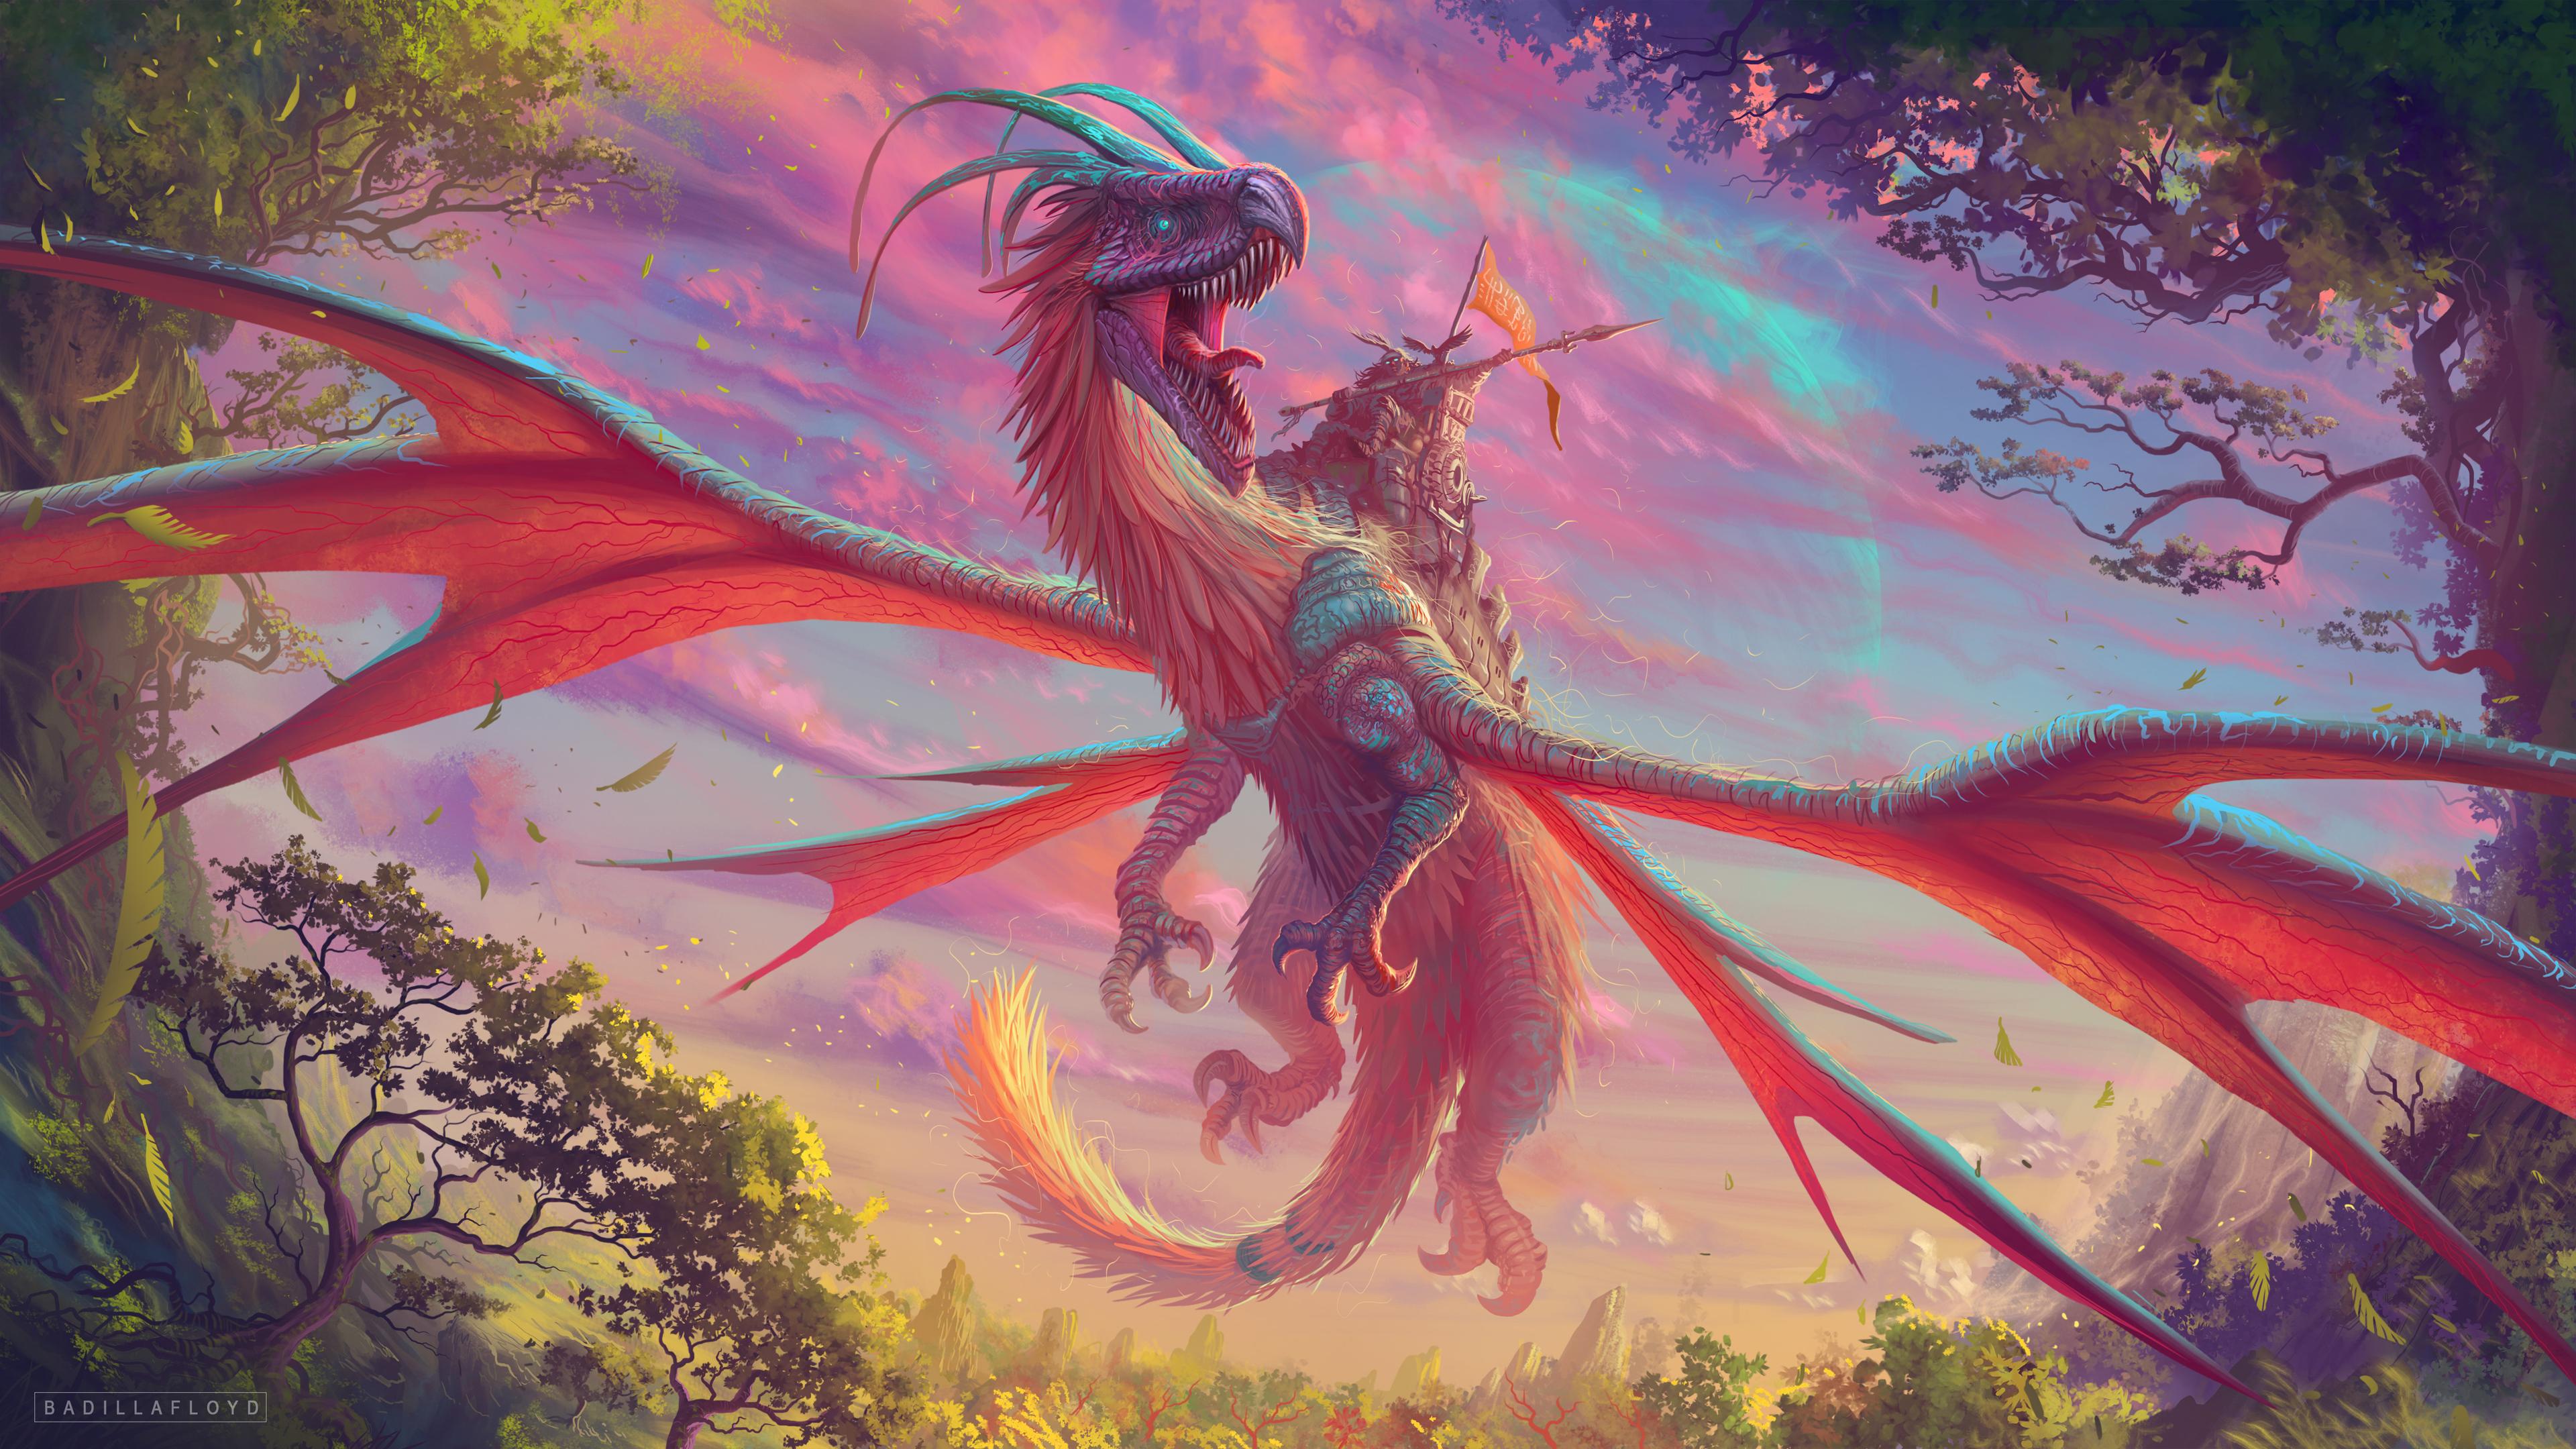 Wallpaper 4k Dragon Warrior Art 4k 4k Wallpapers Artist Wallpapers